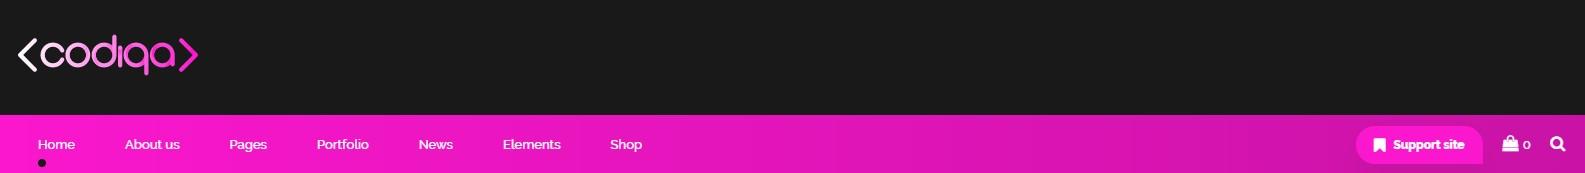 https://documentation.bold-themes.com/codiqa/wp-content/uploads/sites/49/2019/10/header-accent-dark.jpg